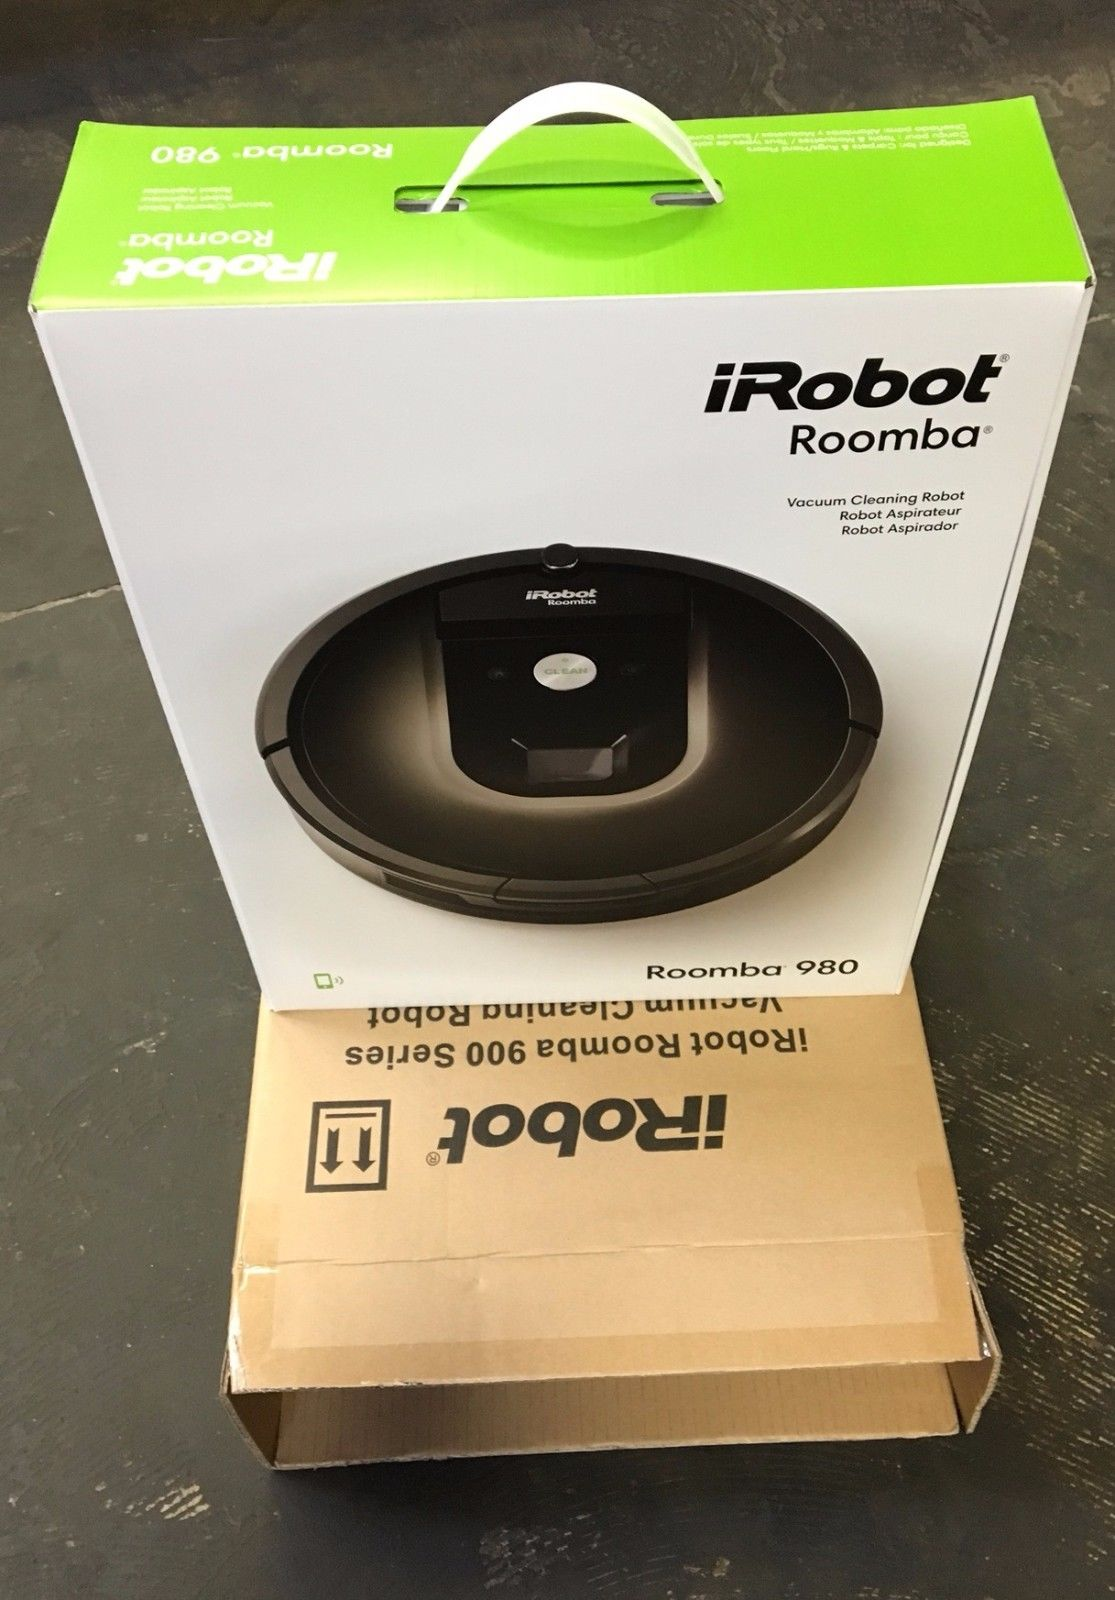 iRobot Roomba 980 Vacuum Cleaning Robot - Pet - R980020 - Brand ...